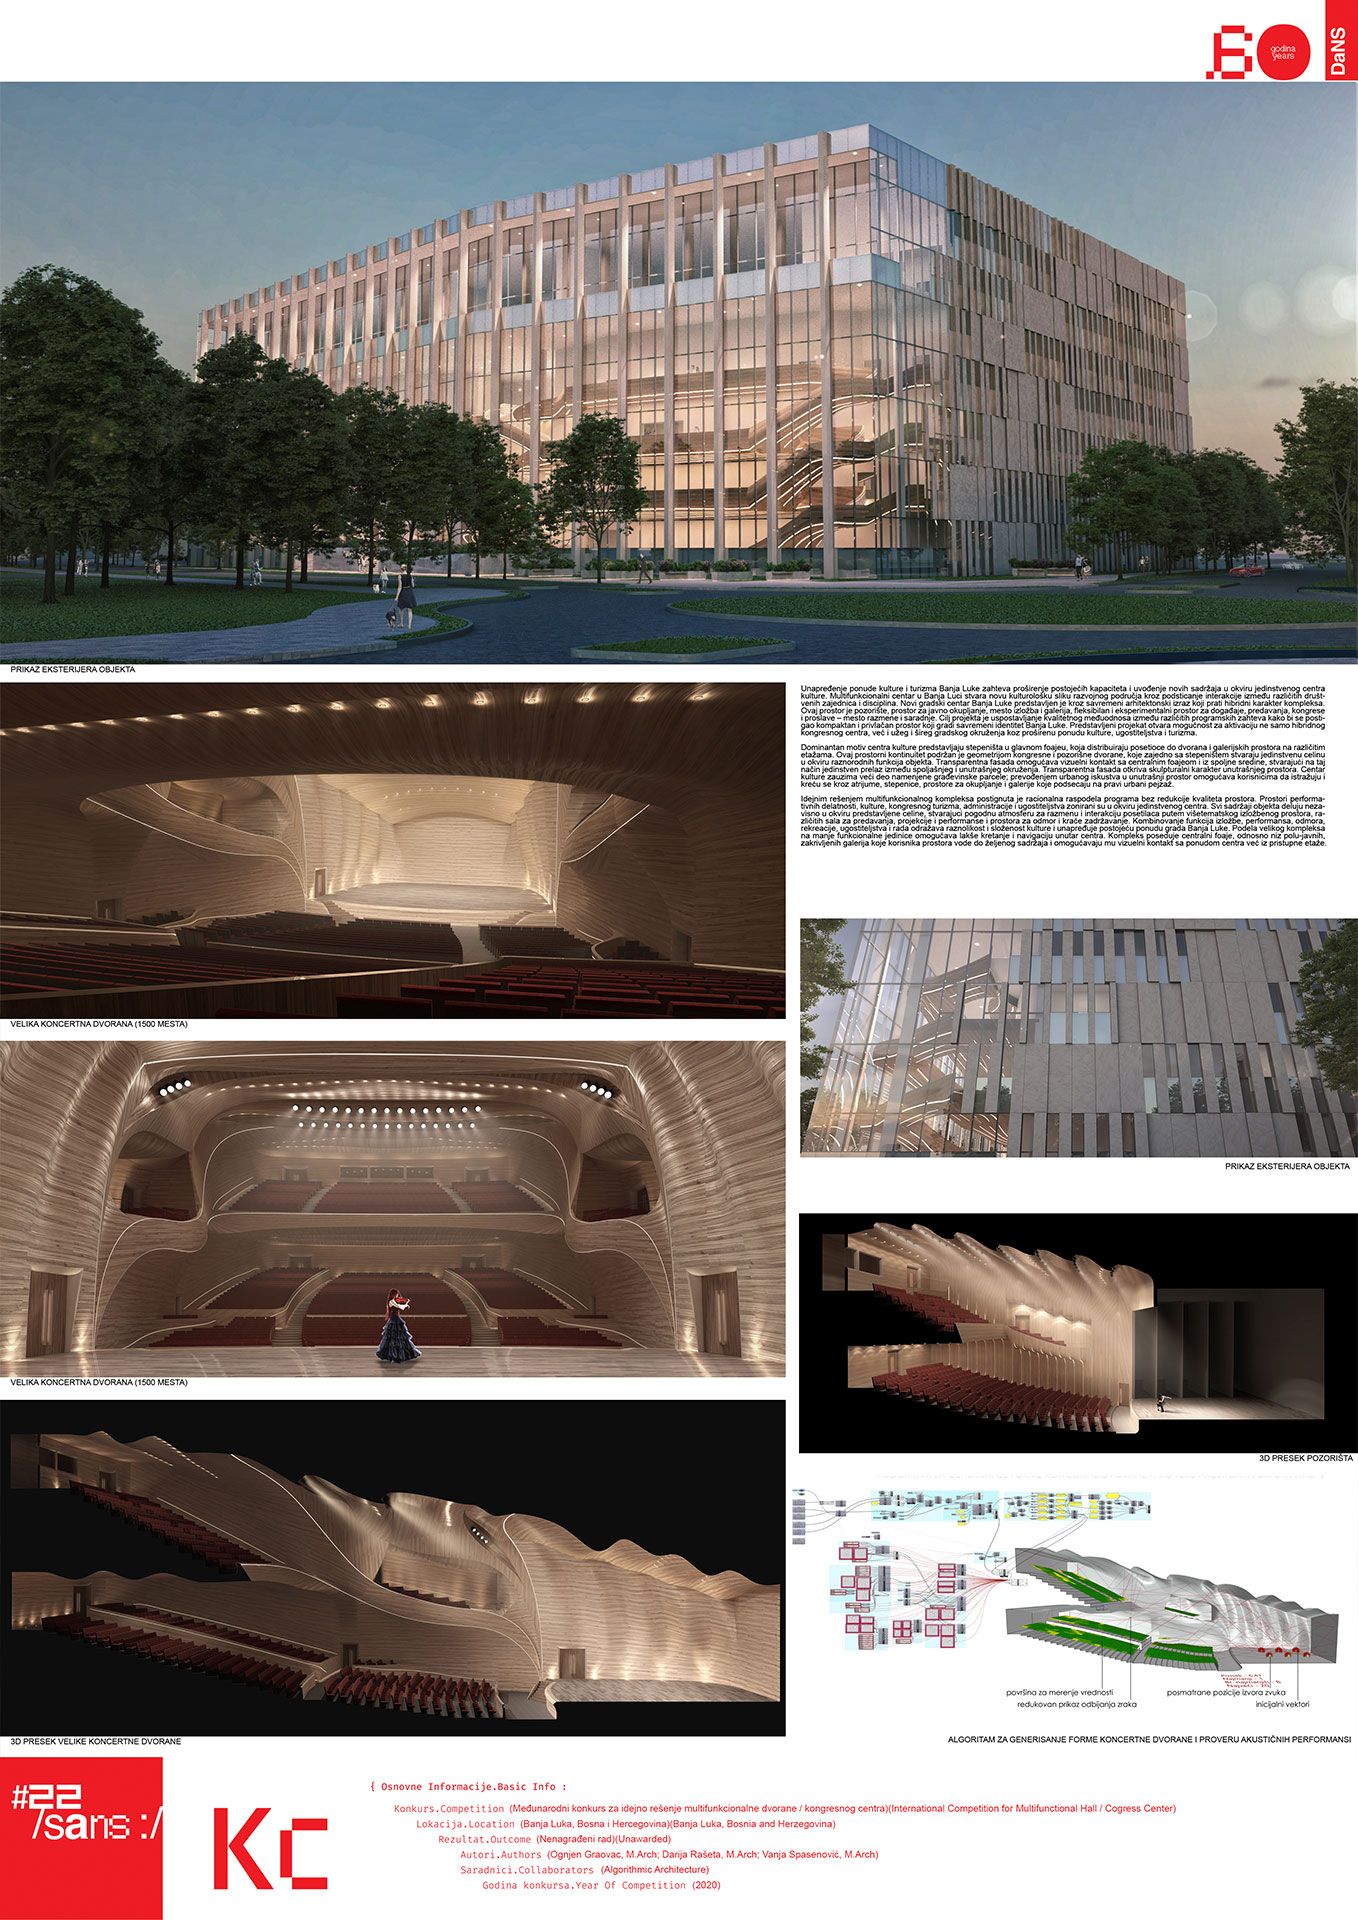 "<p class=""naslov-br"">kc30</p>Idejno rešenje multifunkcionalne dvorane / kongresnog centra u Banja Luci // Conceptual Solution for the Multifunctional Hall / Congress Center in Banja Luka"